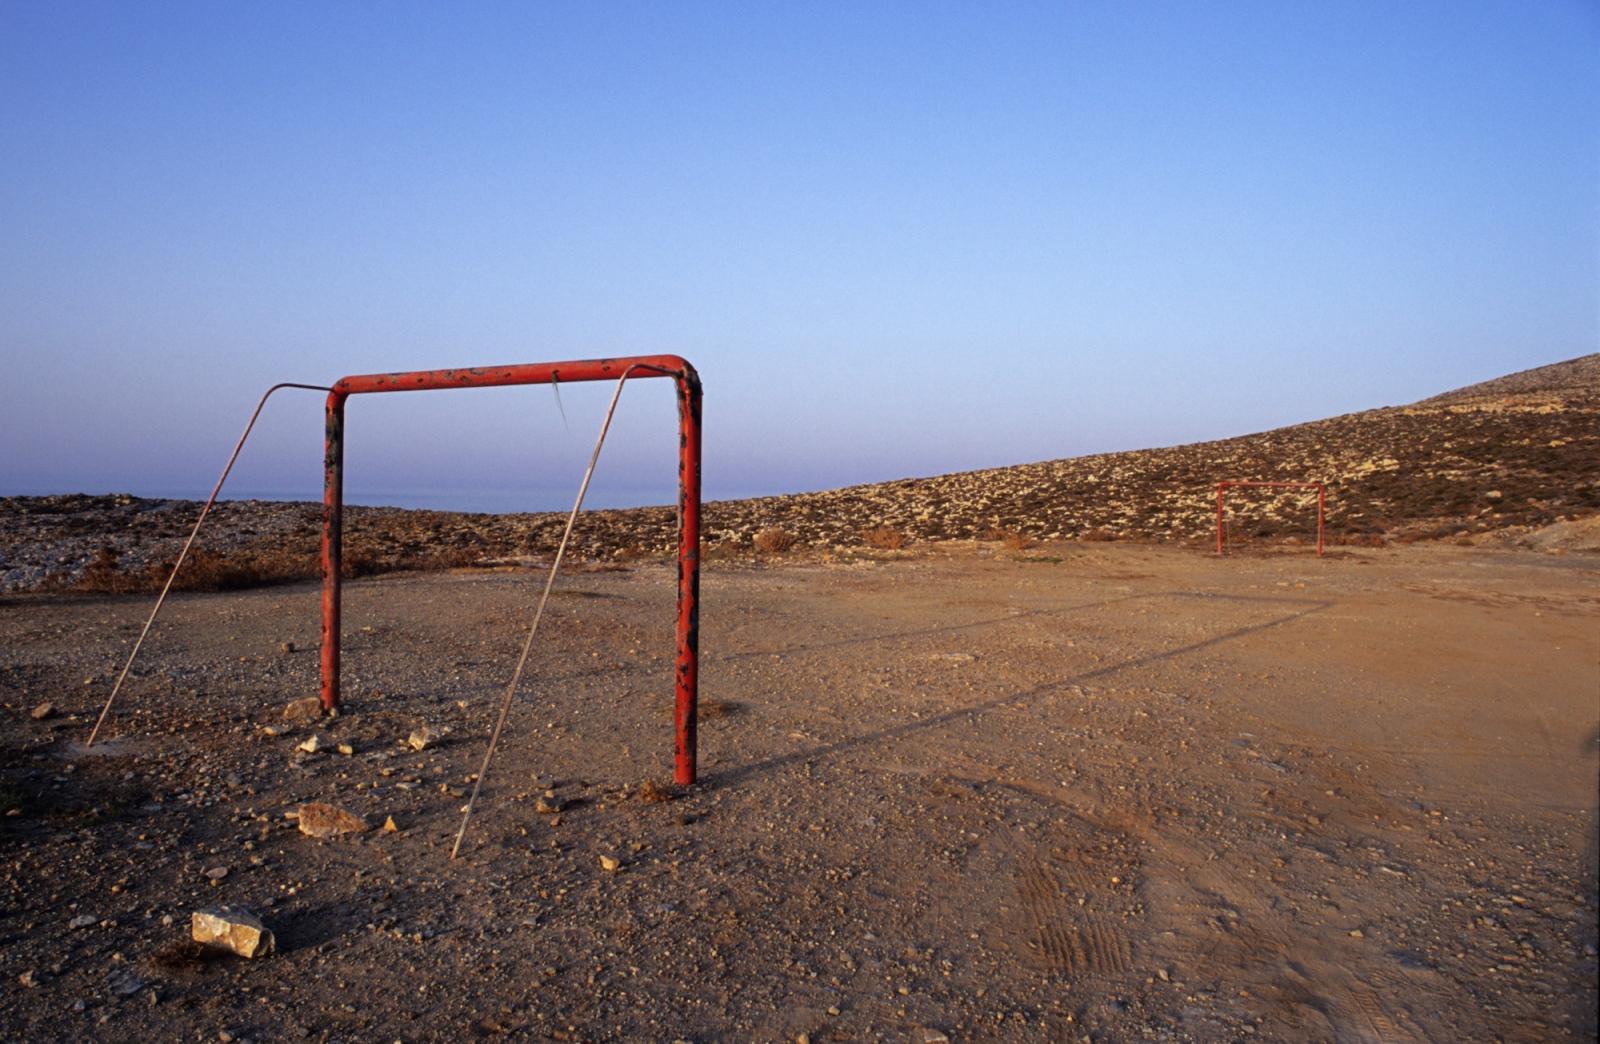 Football field. Serifos island, Greece.